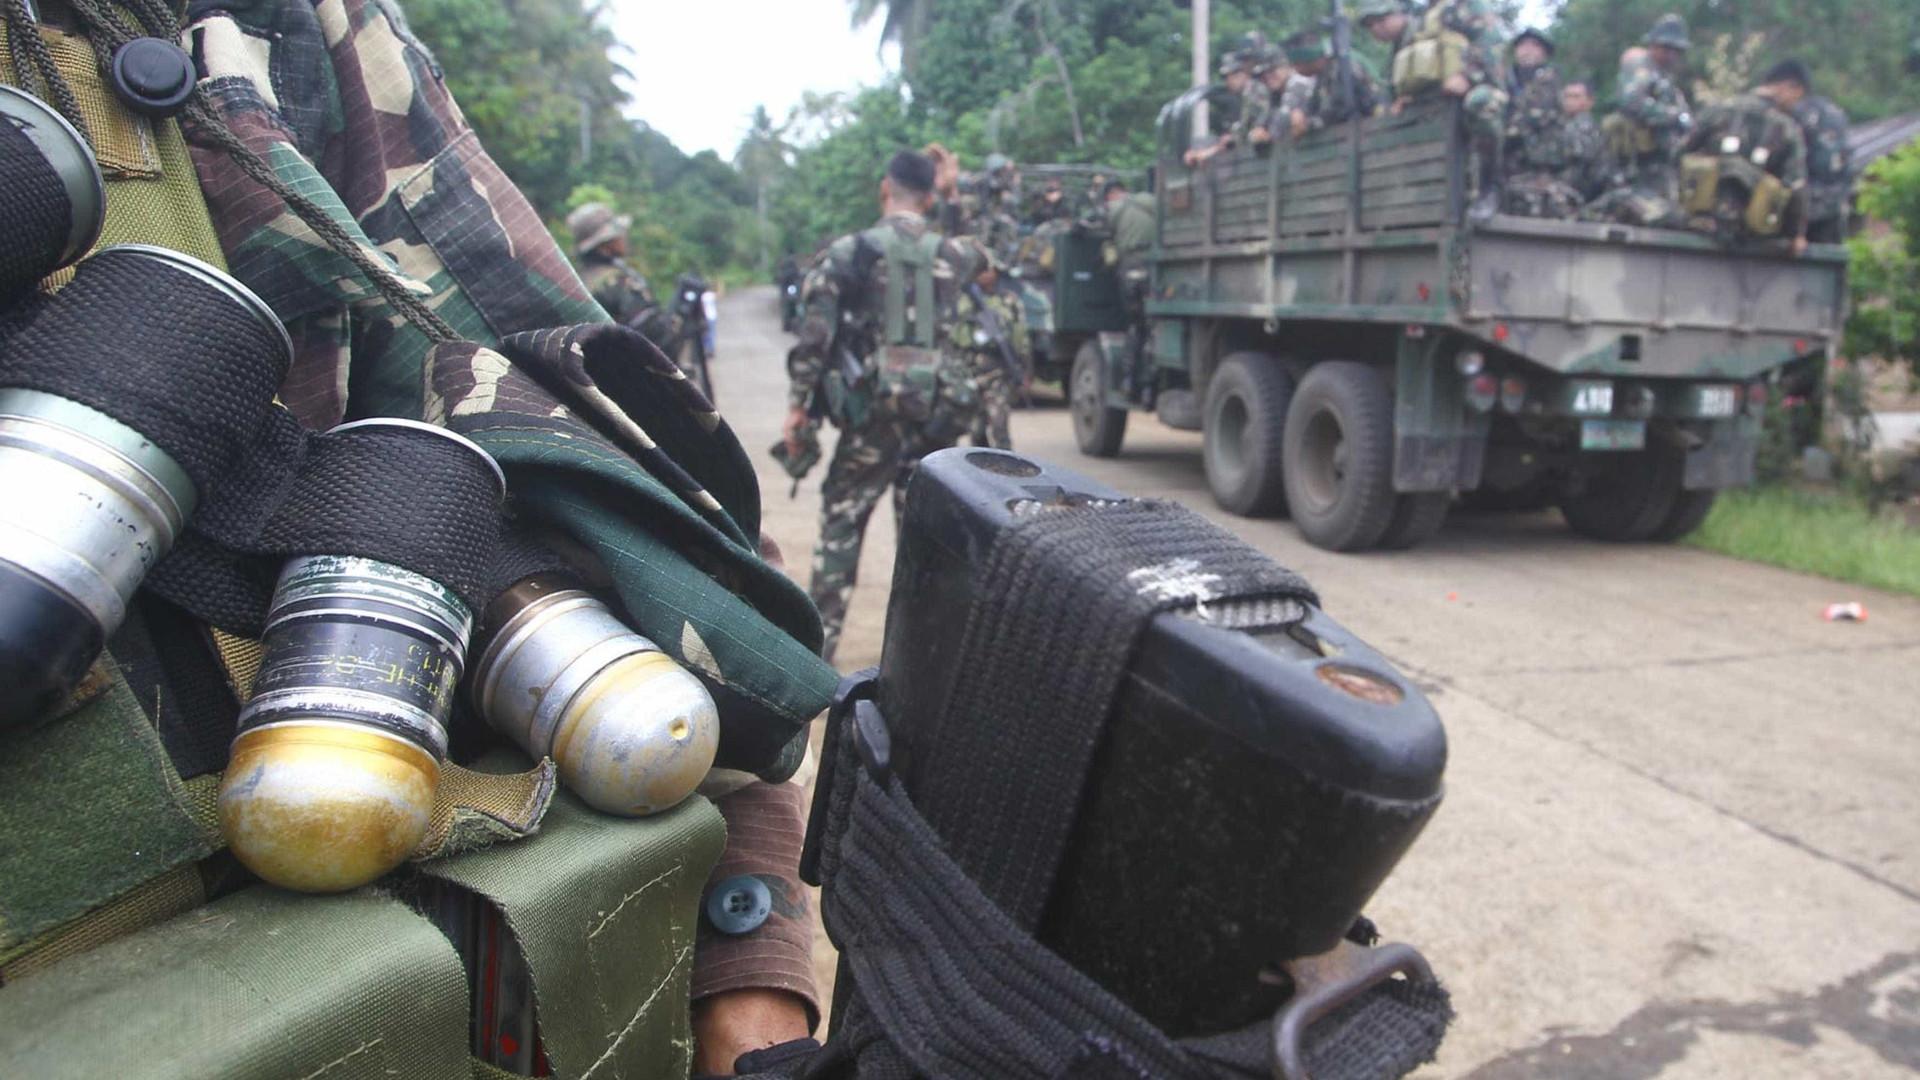 Abu Sayyaf decapitou dois marinheiros vietnamitas